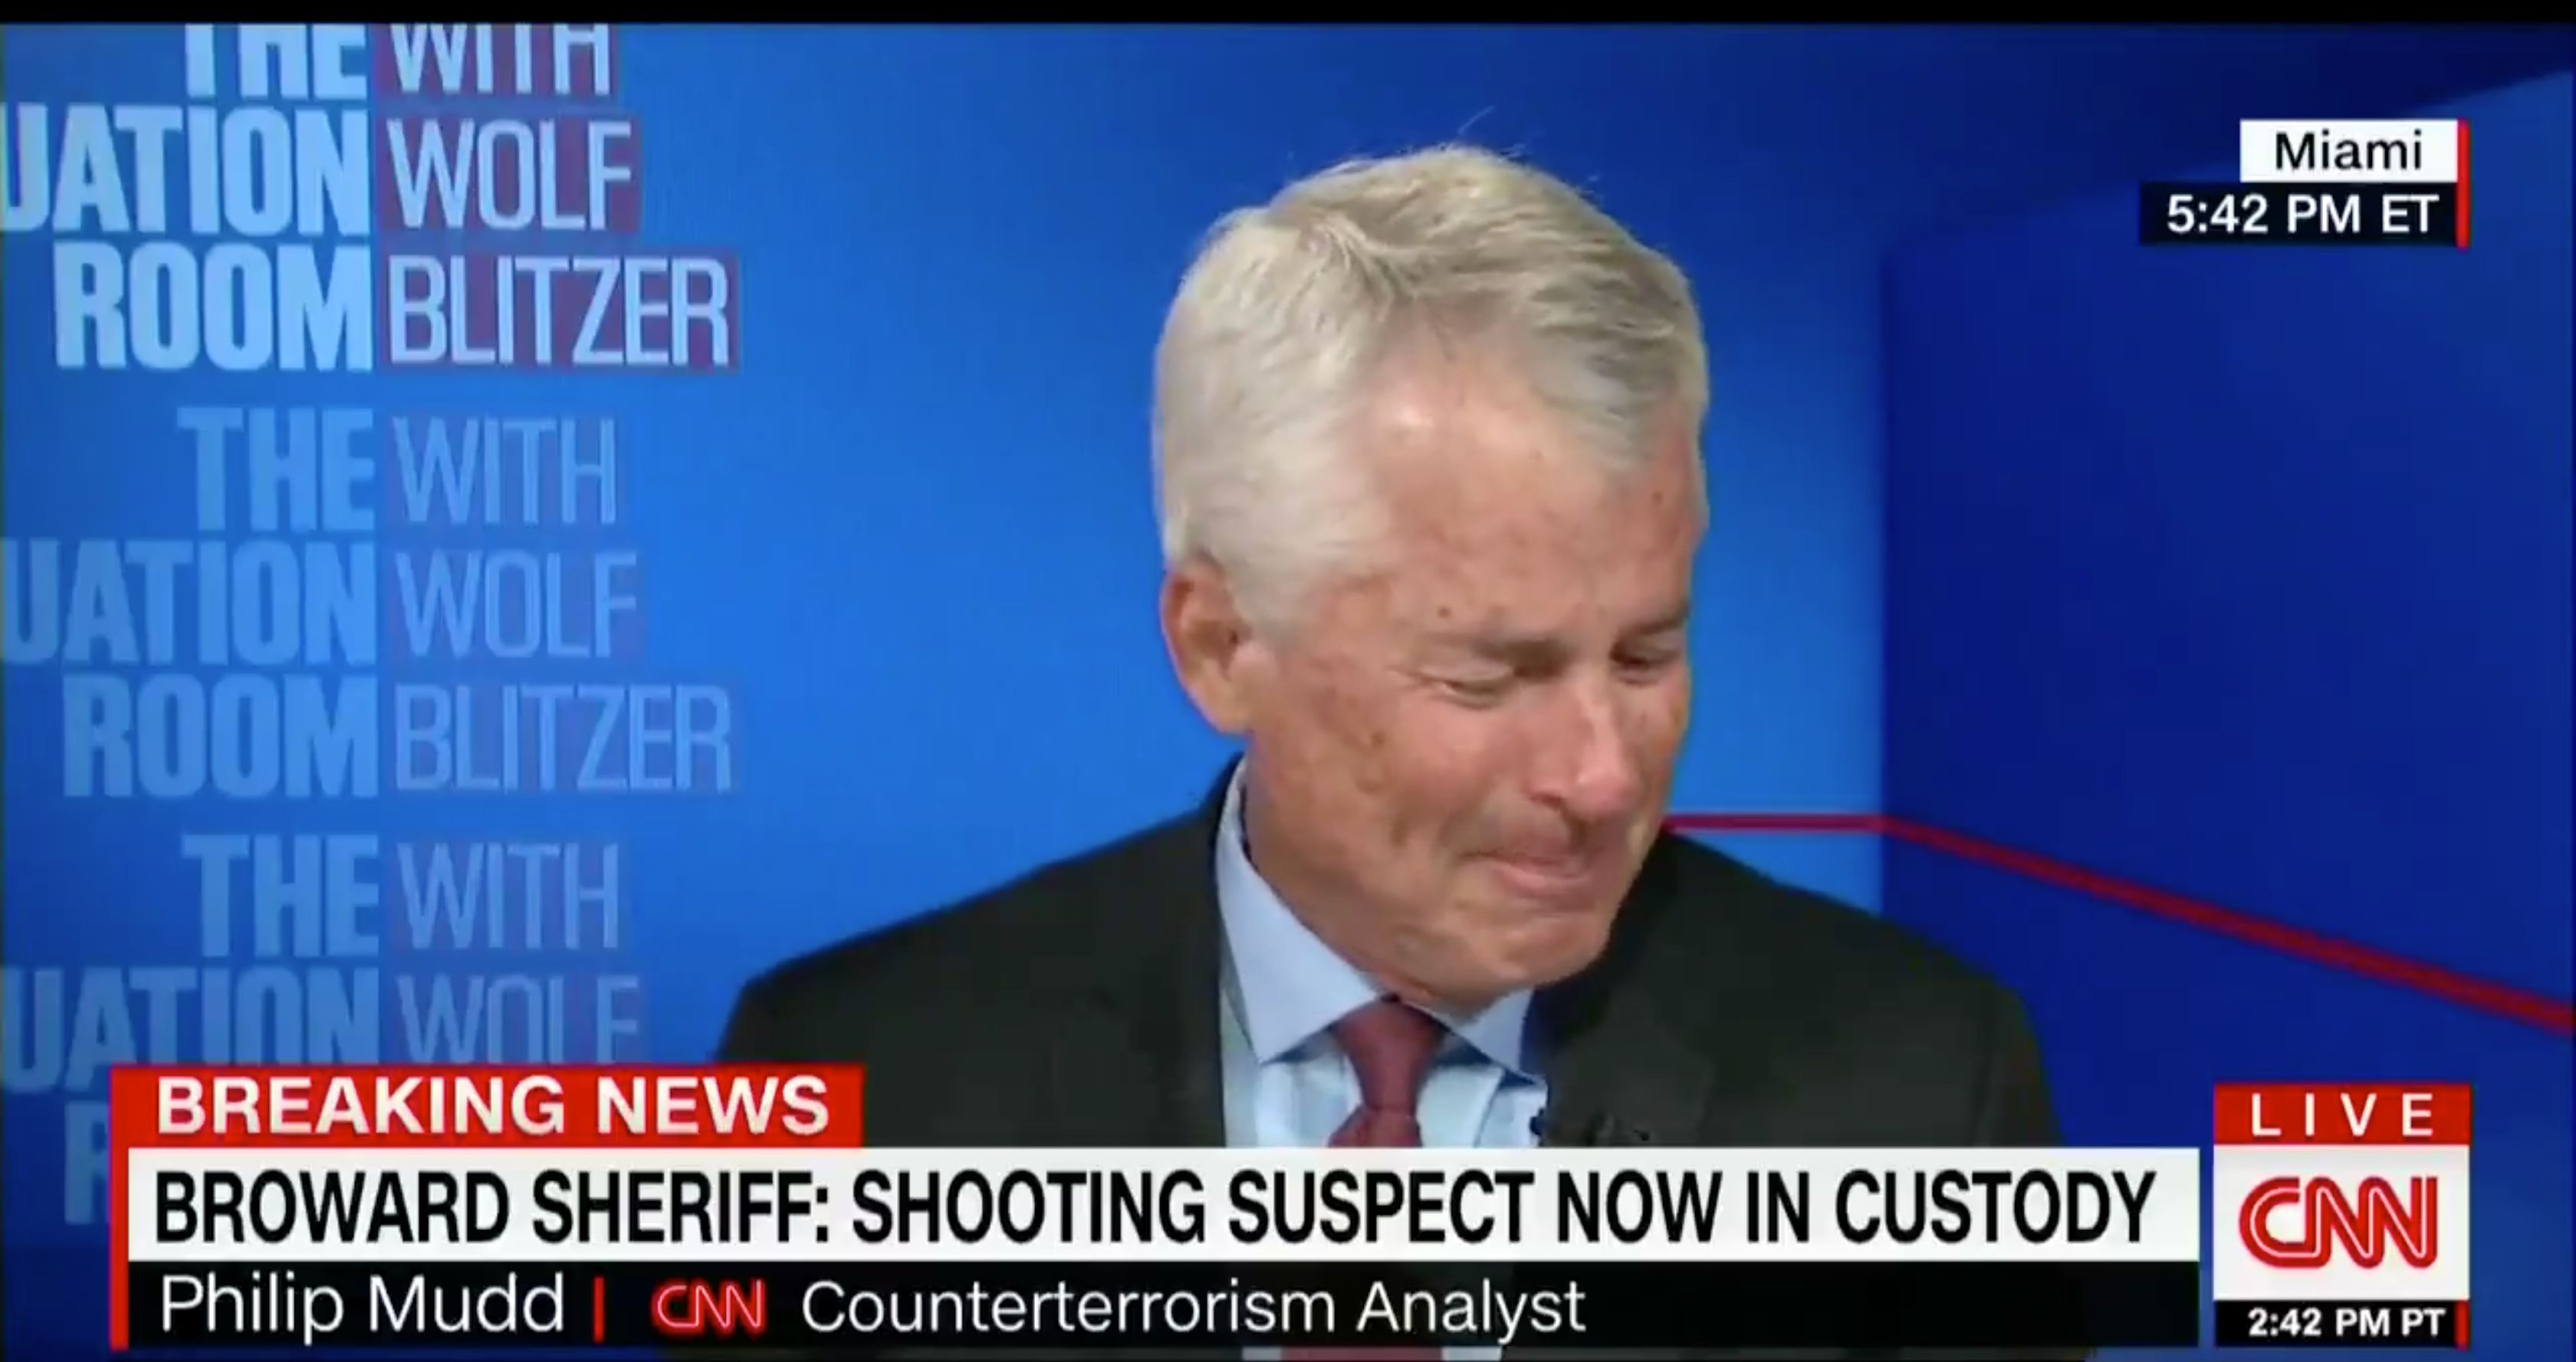 CNN Terror Expert Breaks Down In Tears Over Florida